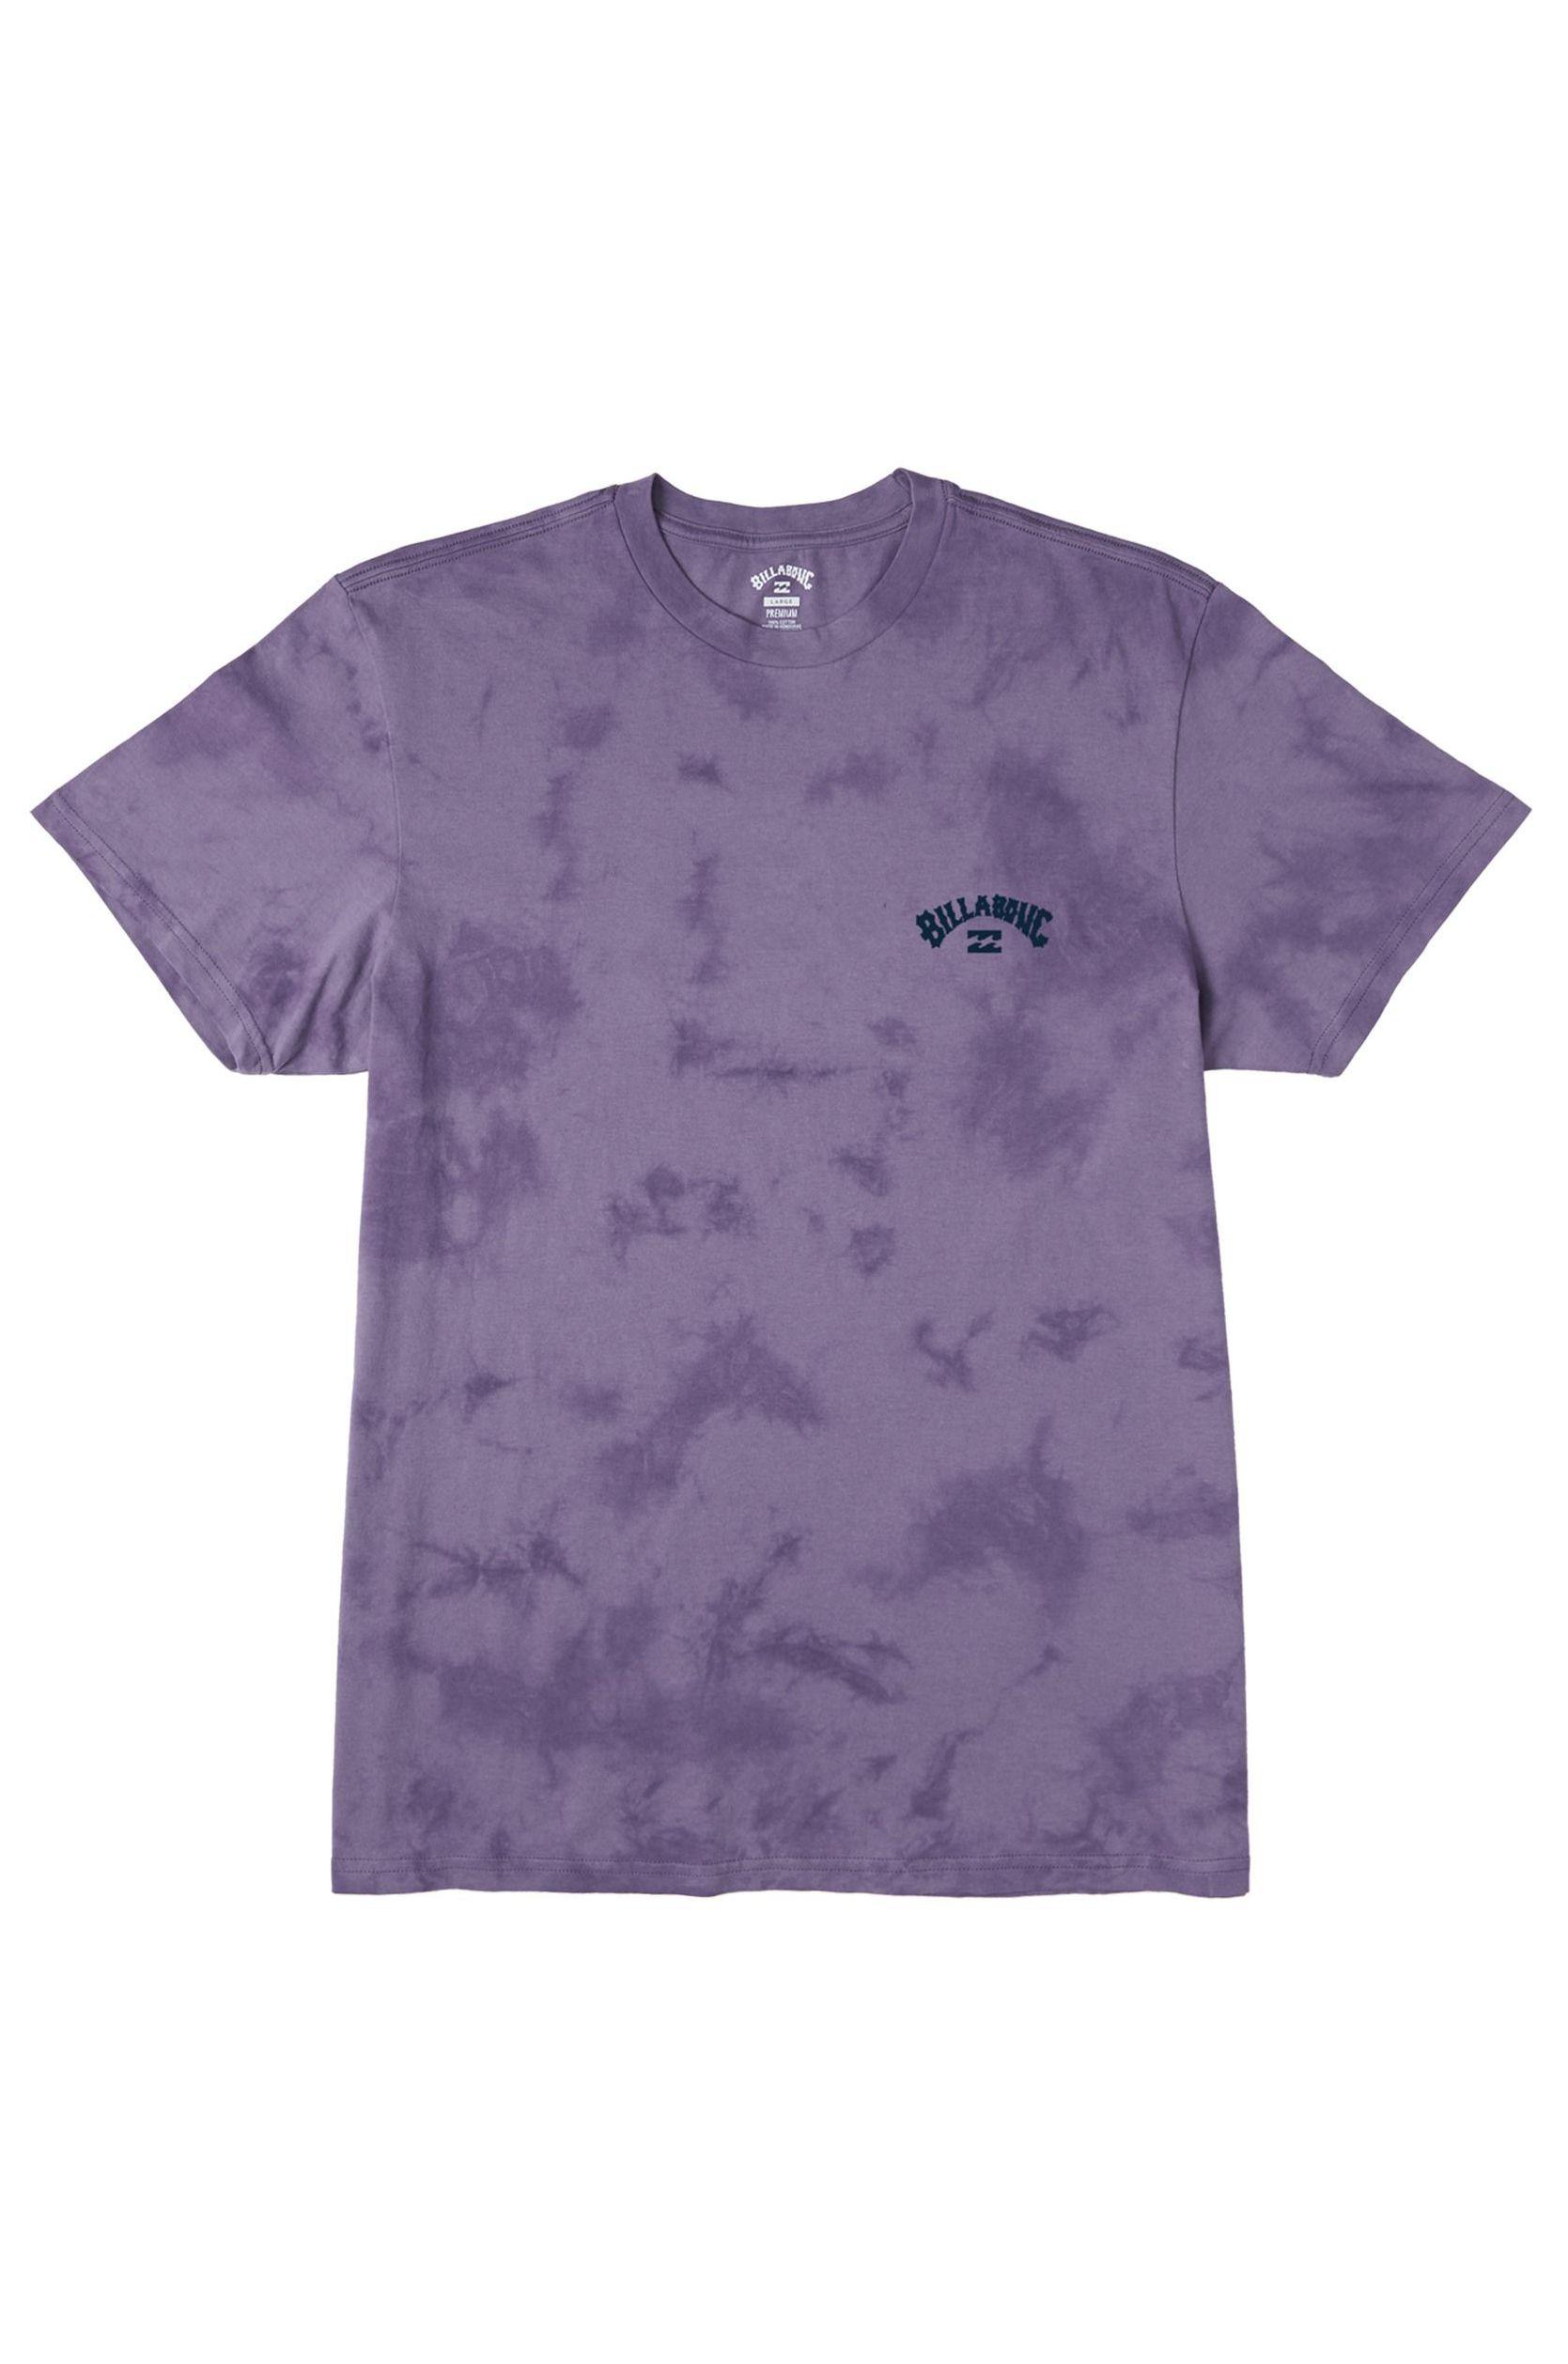 T-Shirt Billabong ARCH WAVE TIE DYE Purple Haze